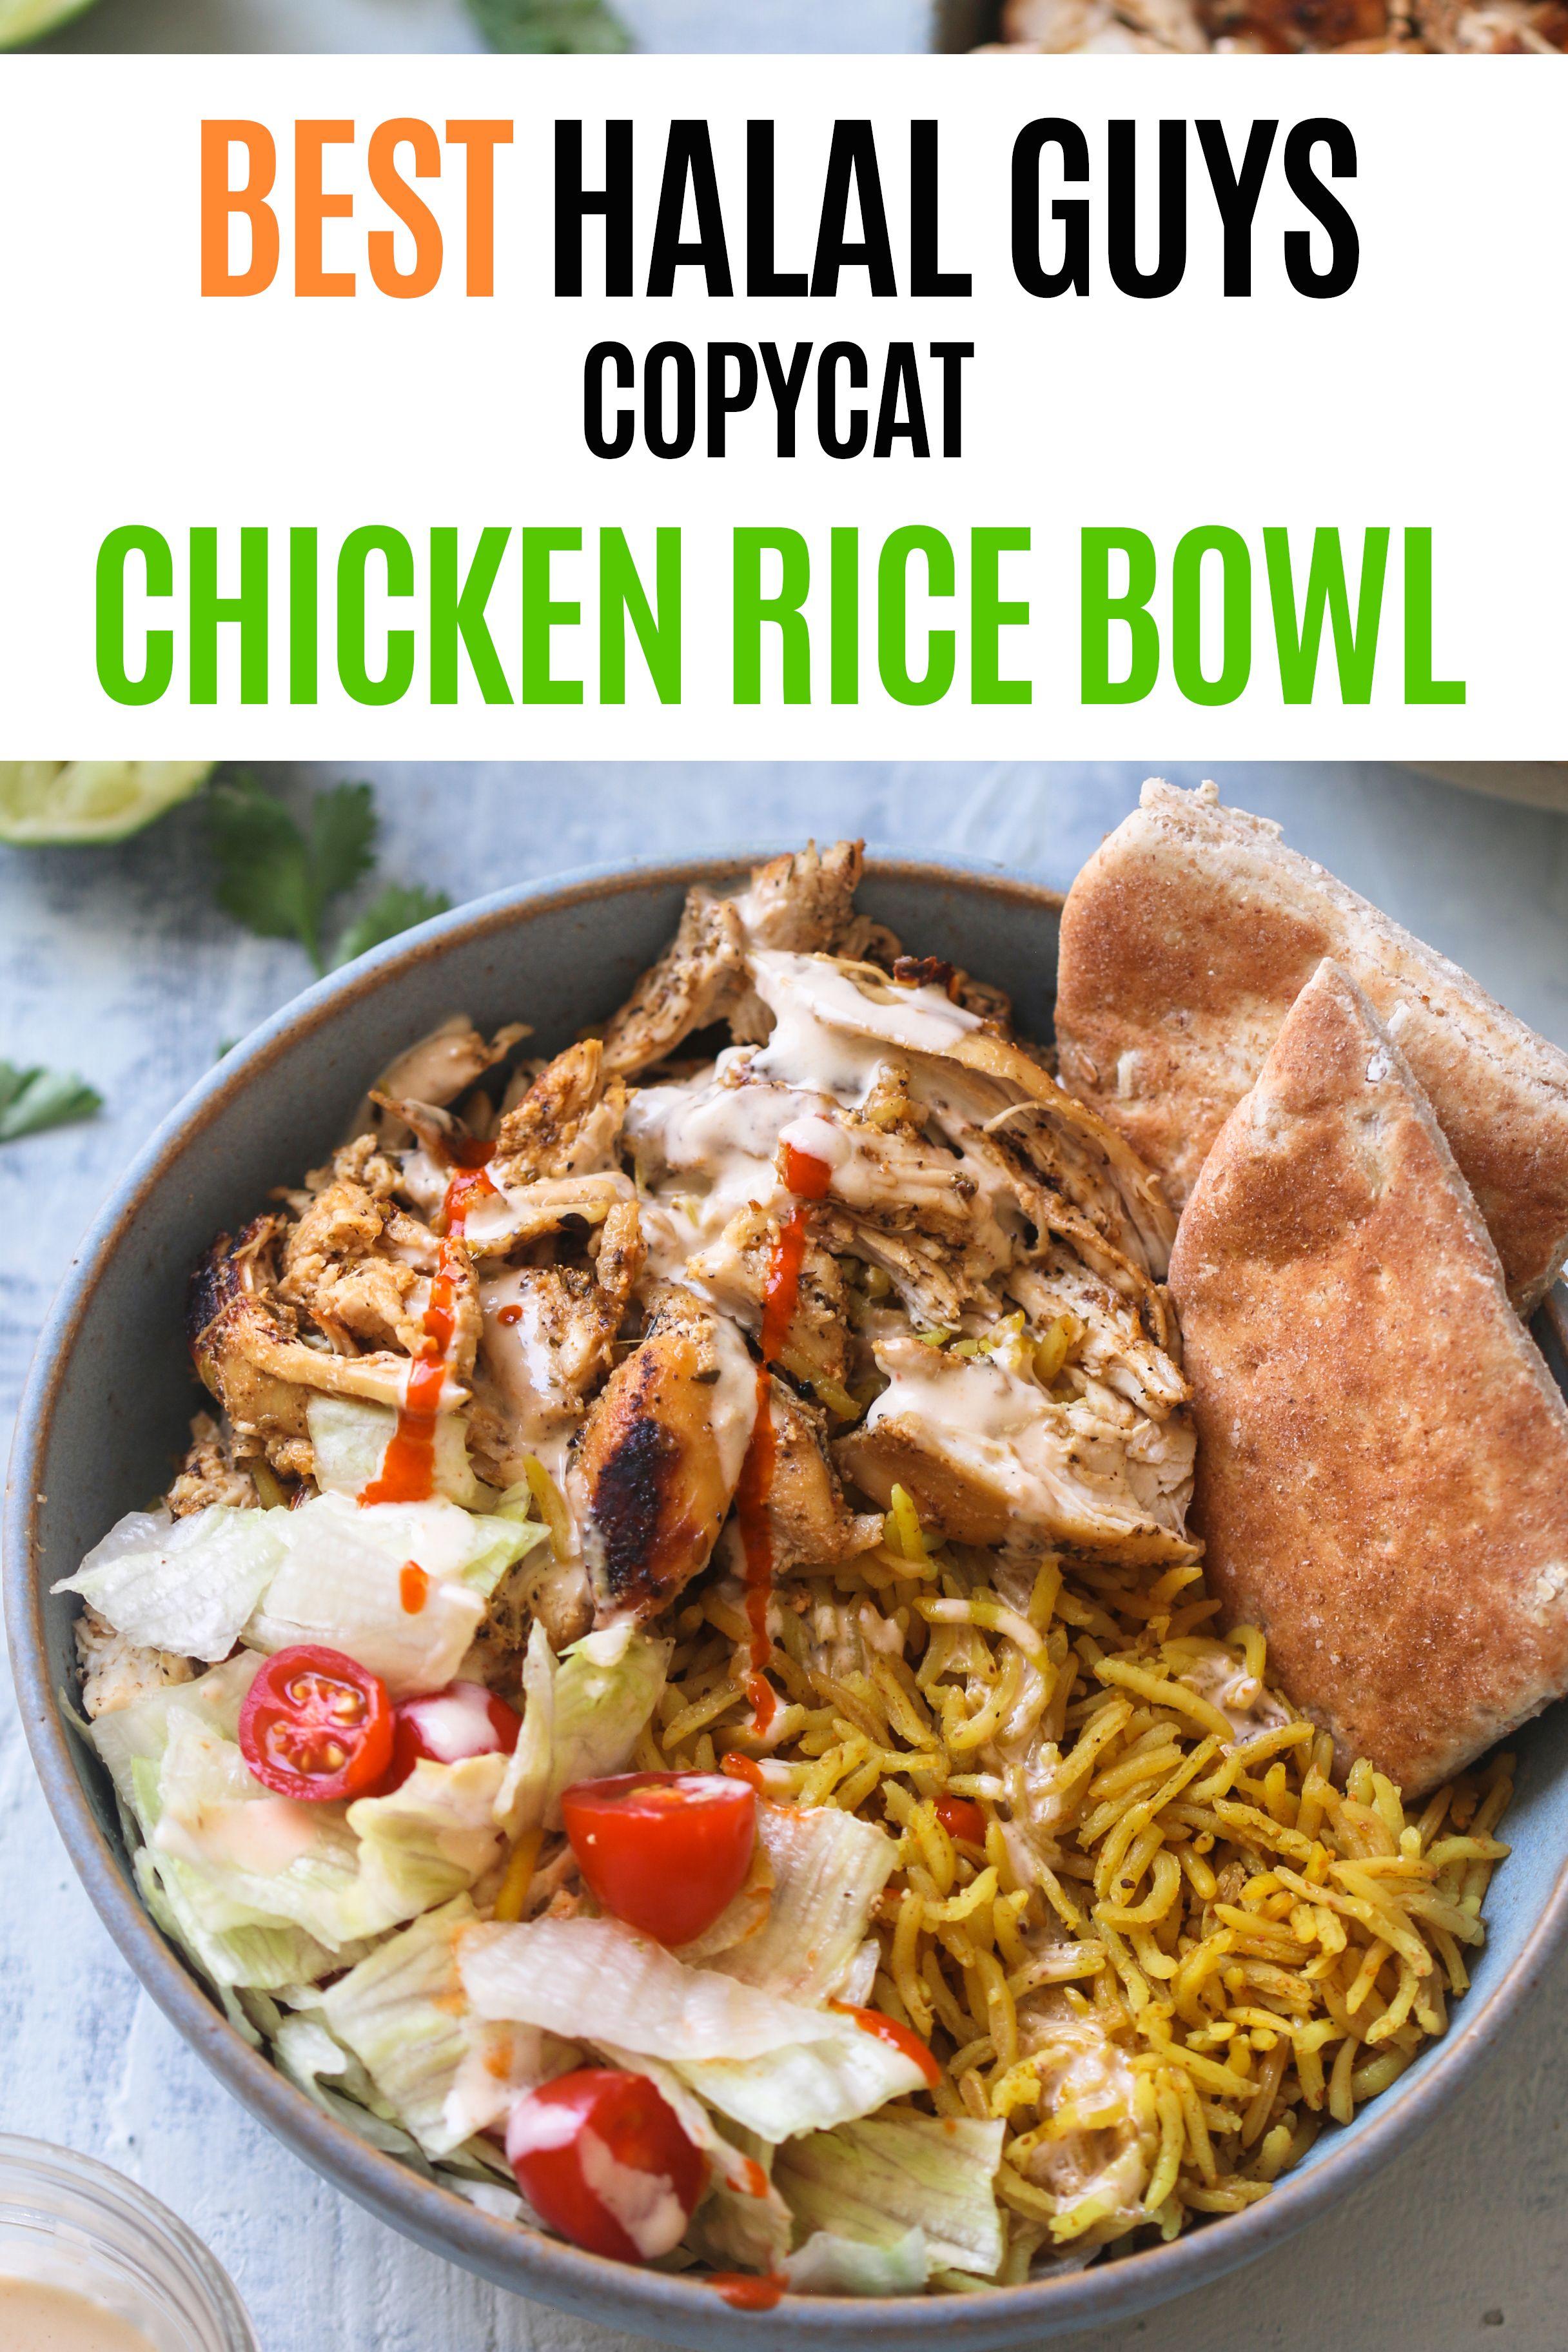 Halal Guys Chicken Rice Bowl Copycat Recipe Foodfashionparty Halalguyschicken Chickenbowl Chicken Rice Bowls Halal Guys Recipe Chicken Recipes Halal